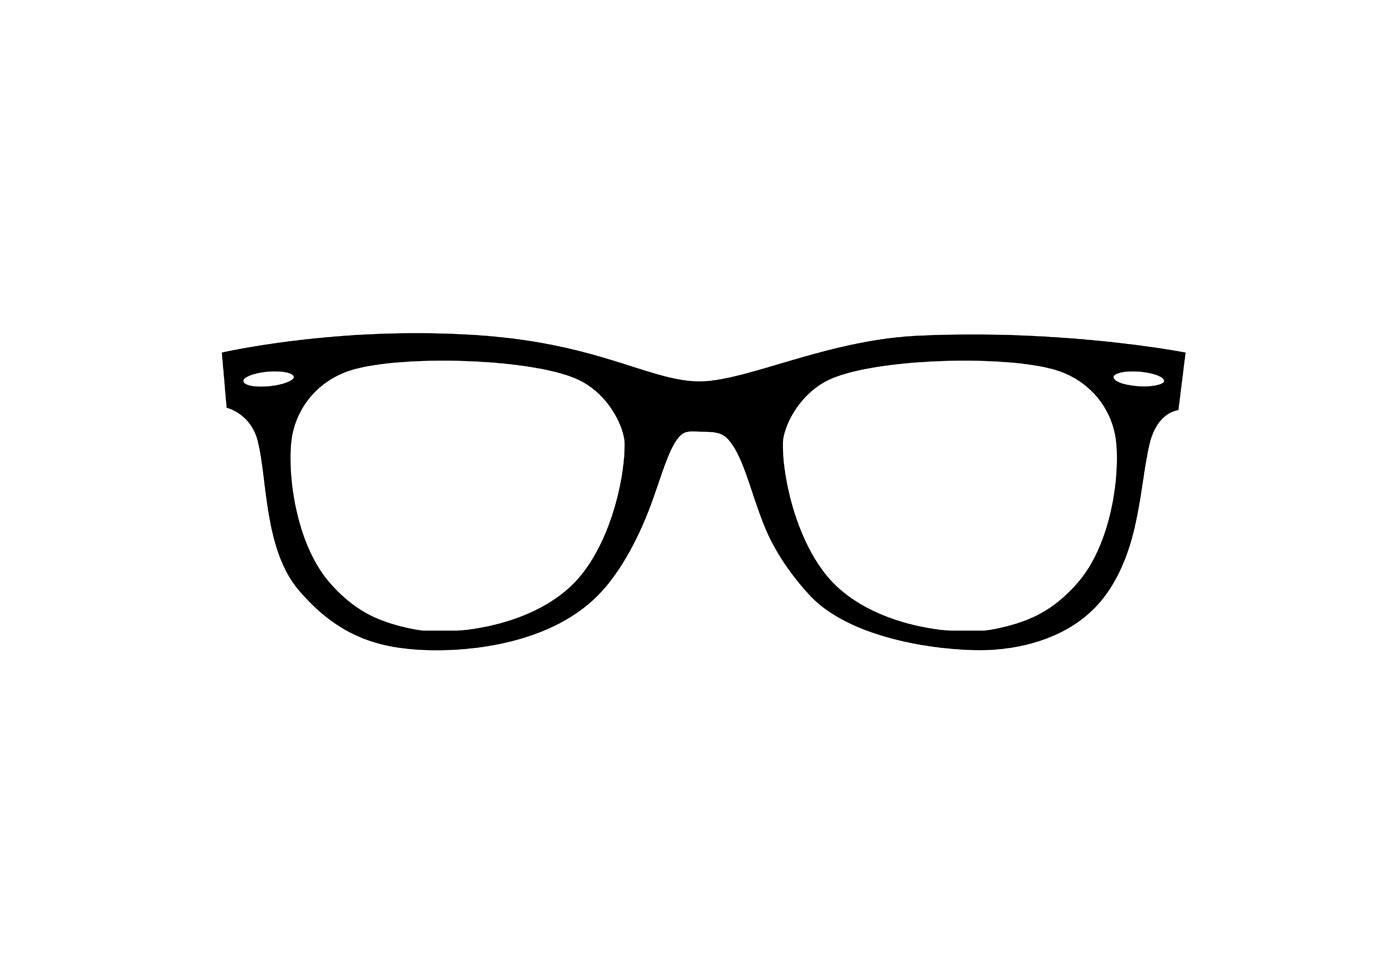 6f1bbf6aba98 Free Ray Ban Glasses Vector « Heritage Malta